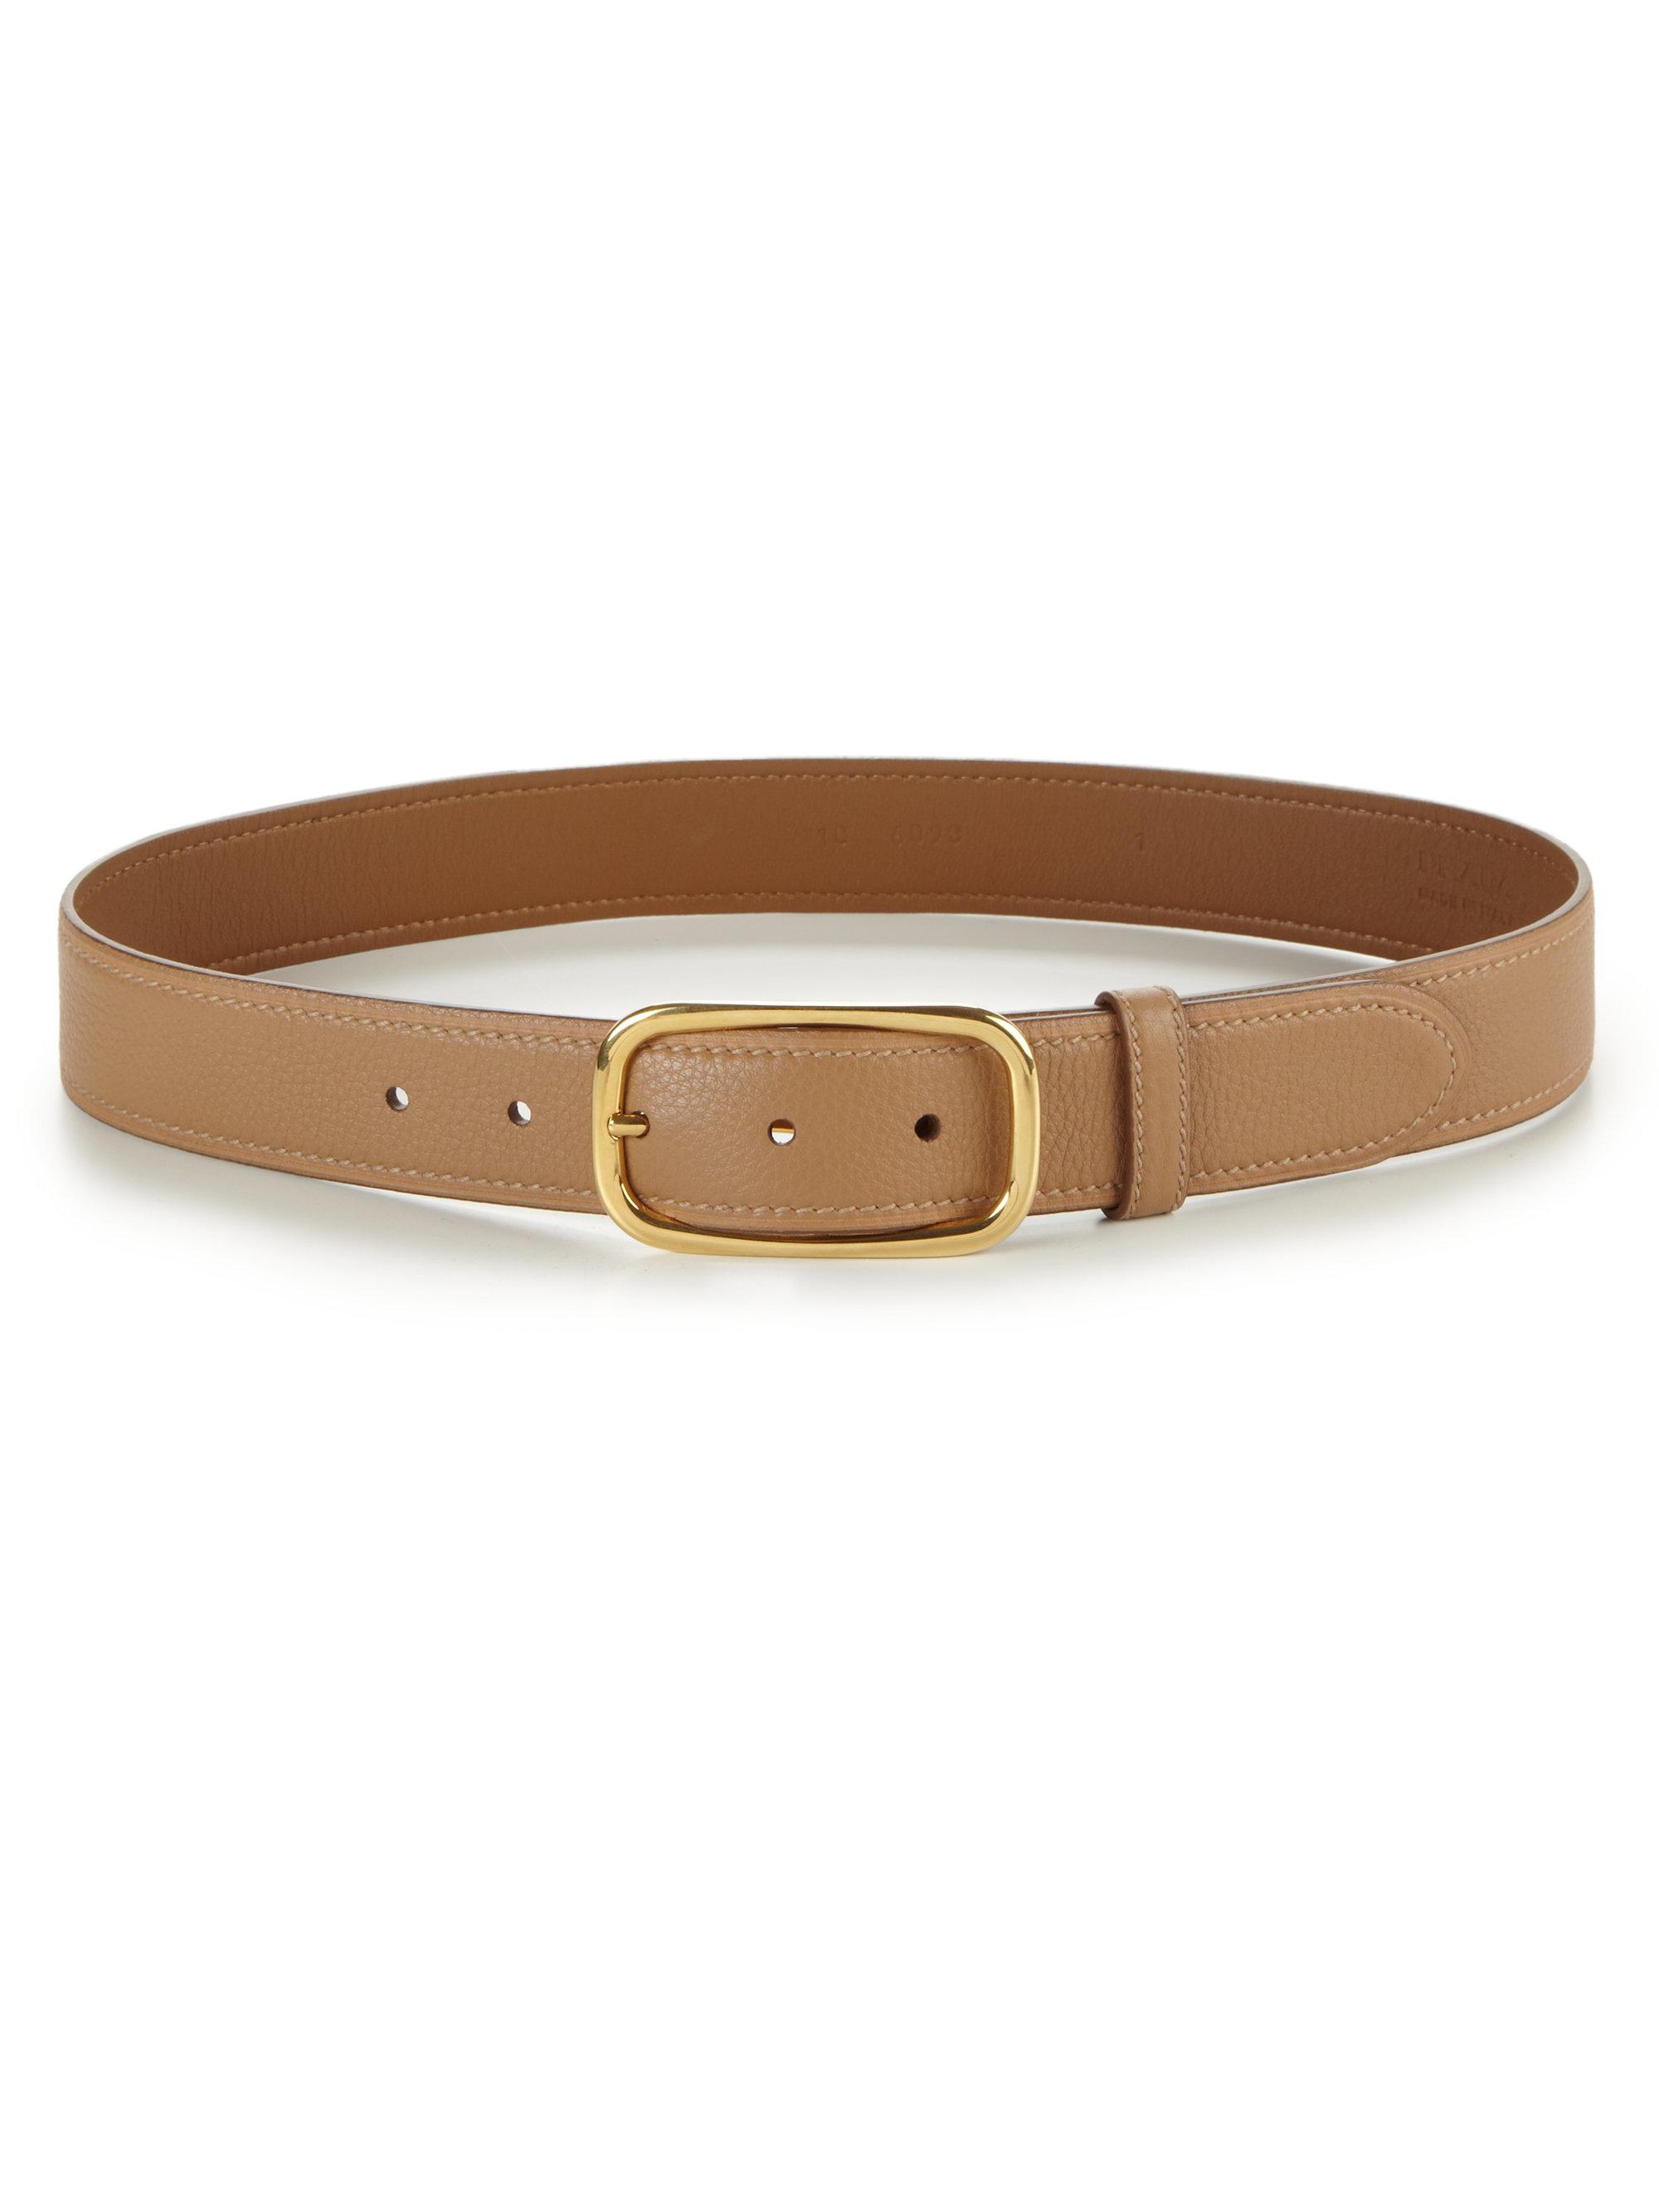 Prada Daino Pebbled Leather Belt In Beige